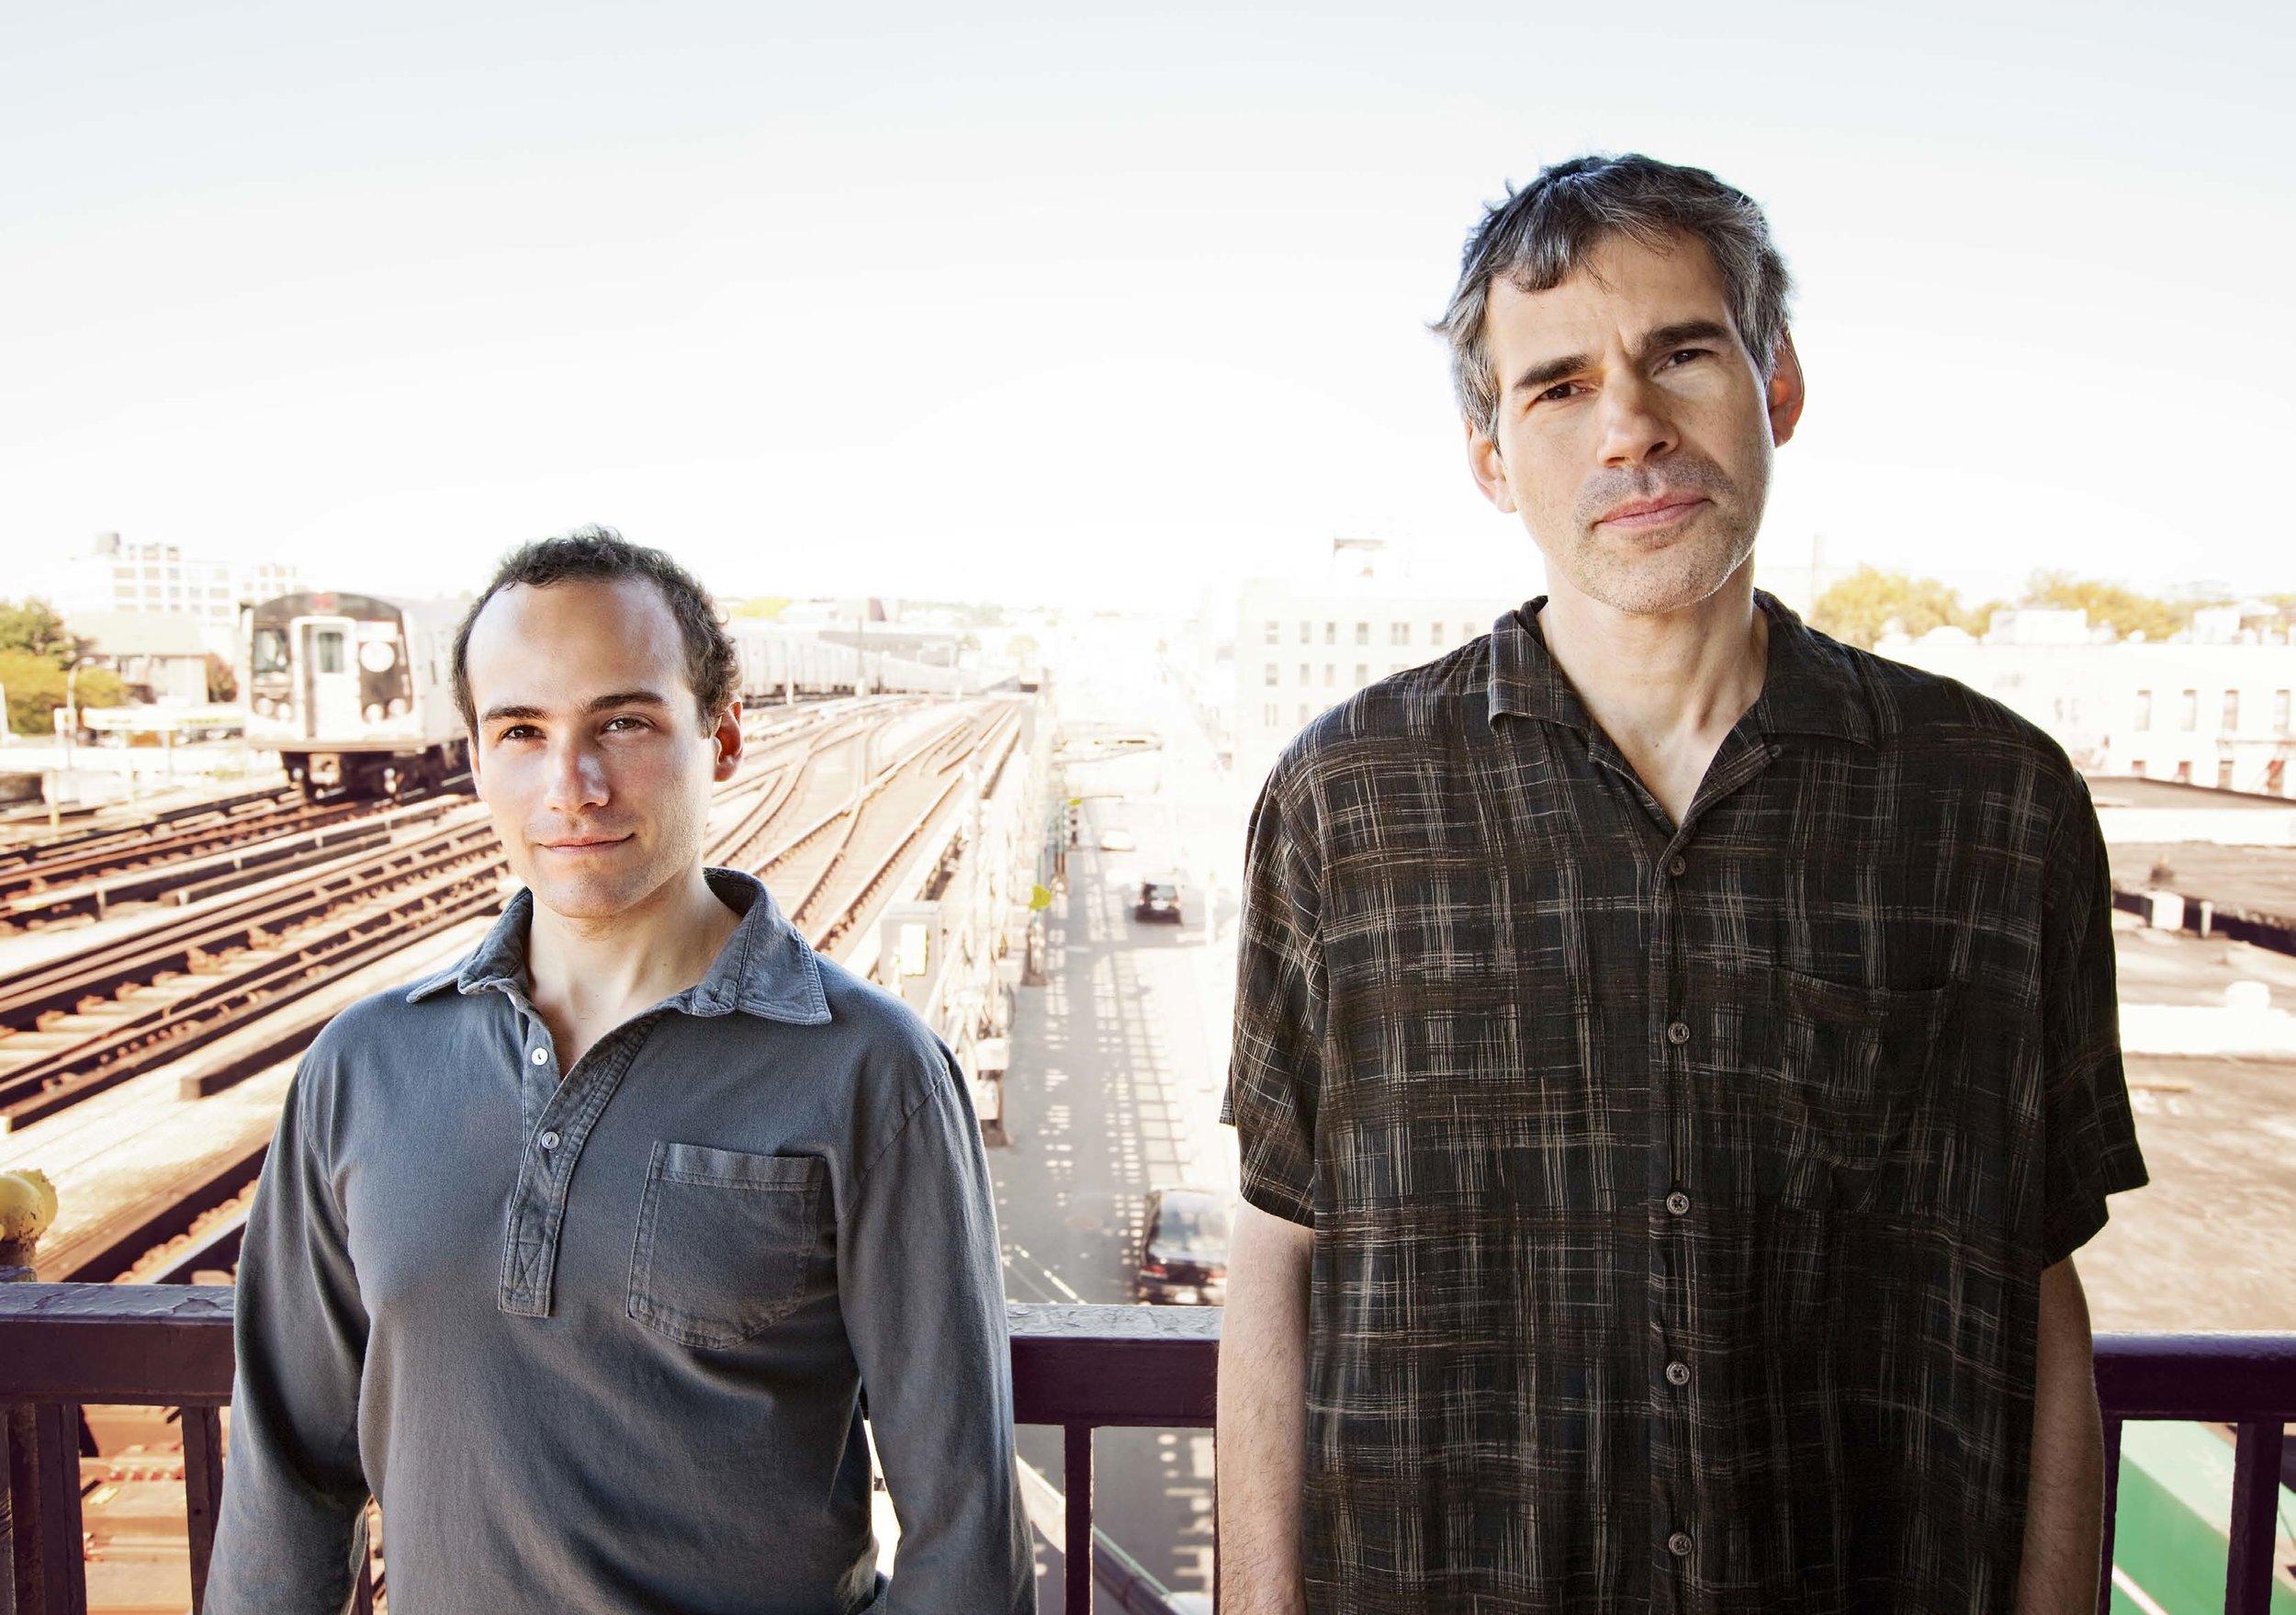 Aaron Shragge & Ben Monder